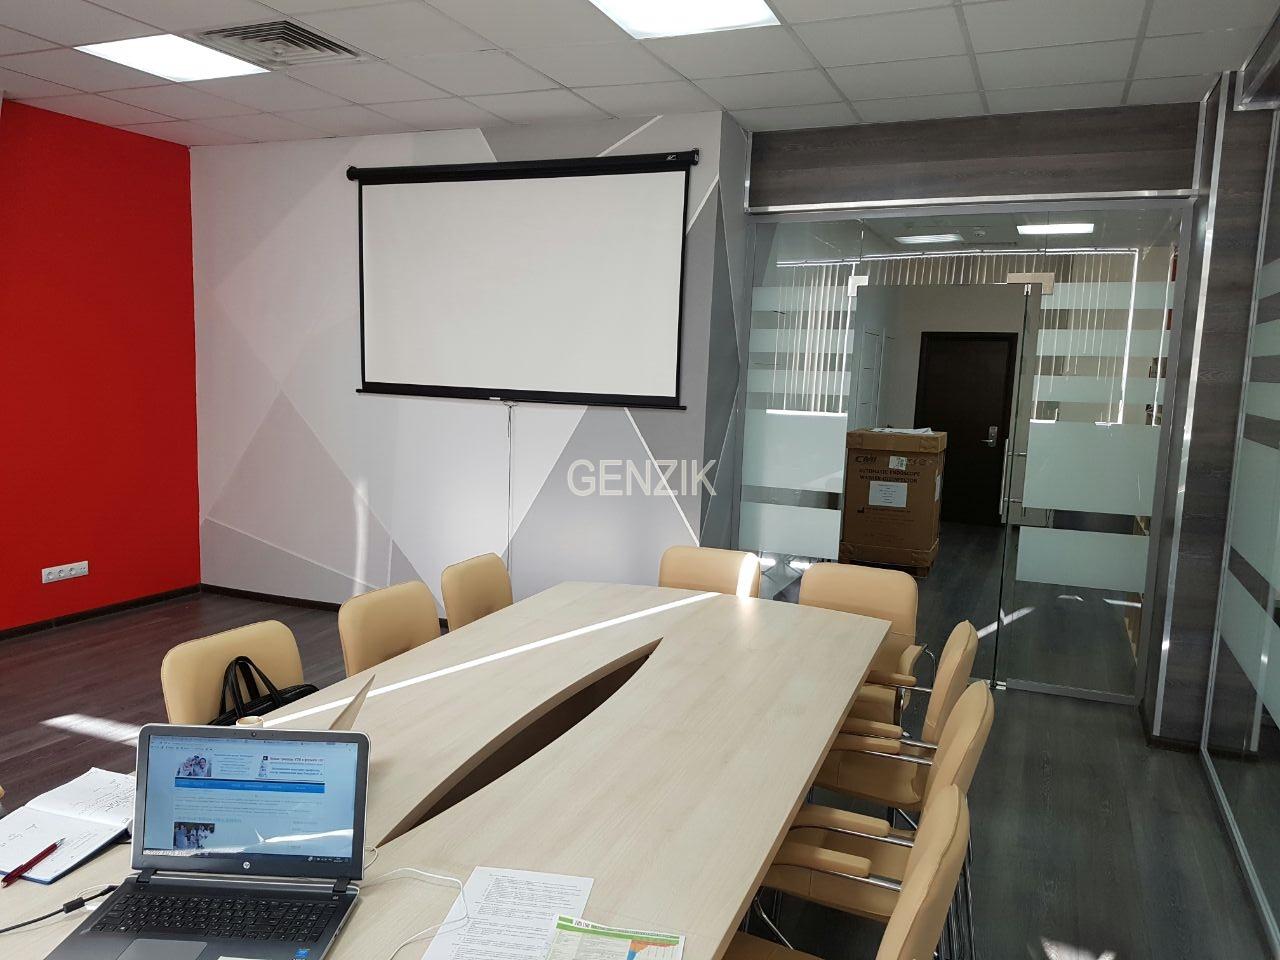 Зал для переговоров и совещаний